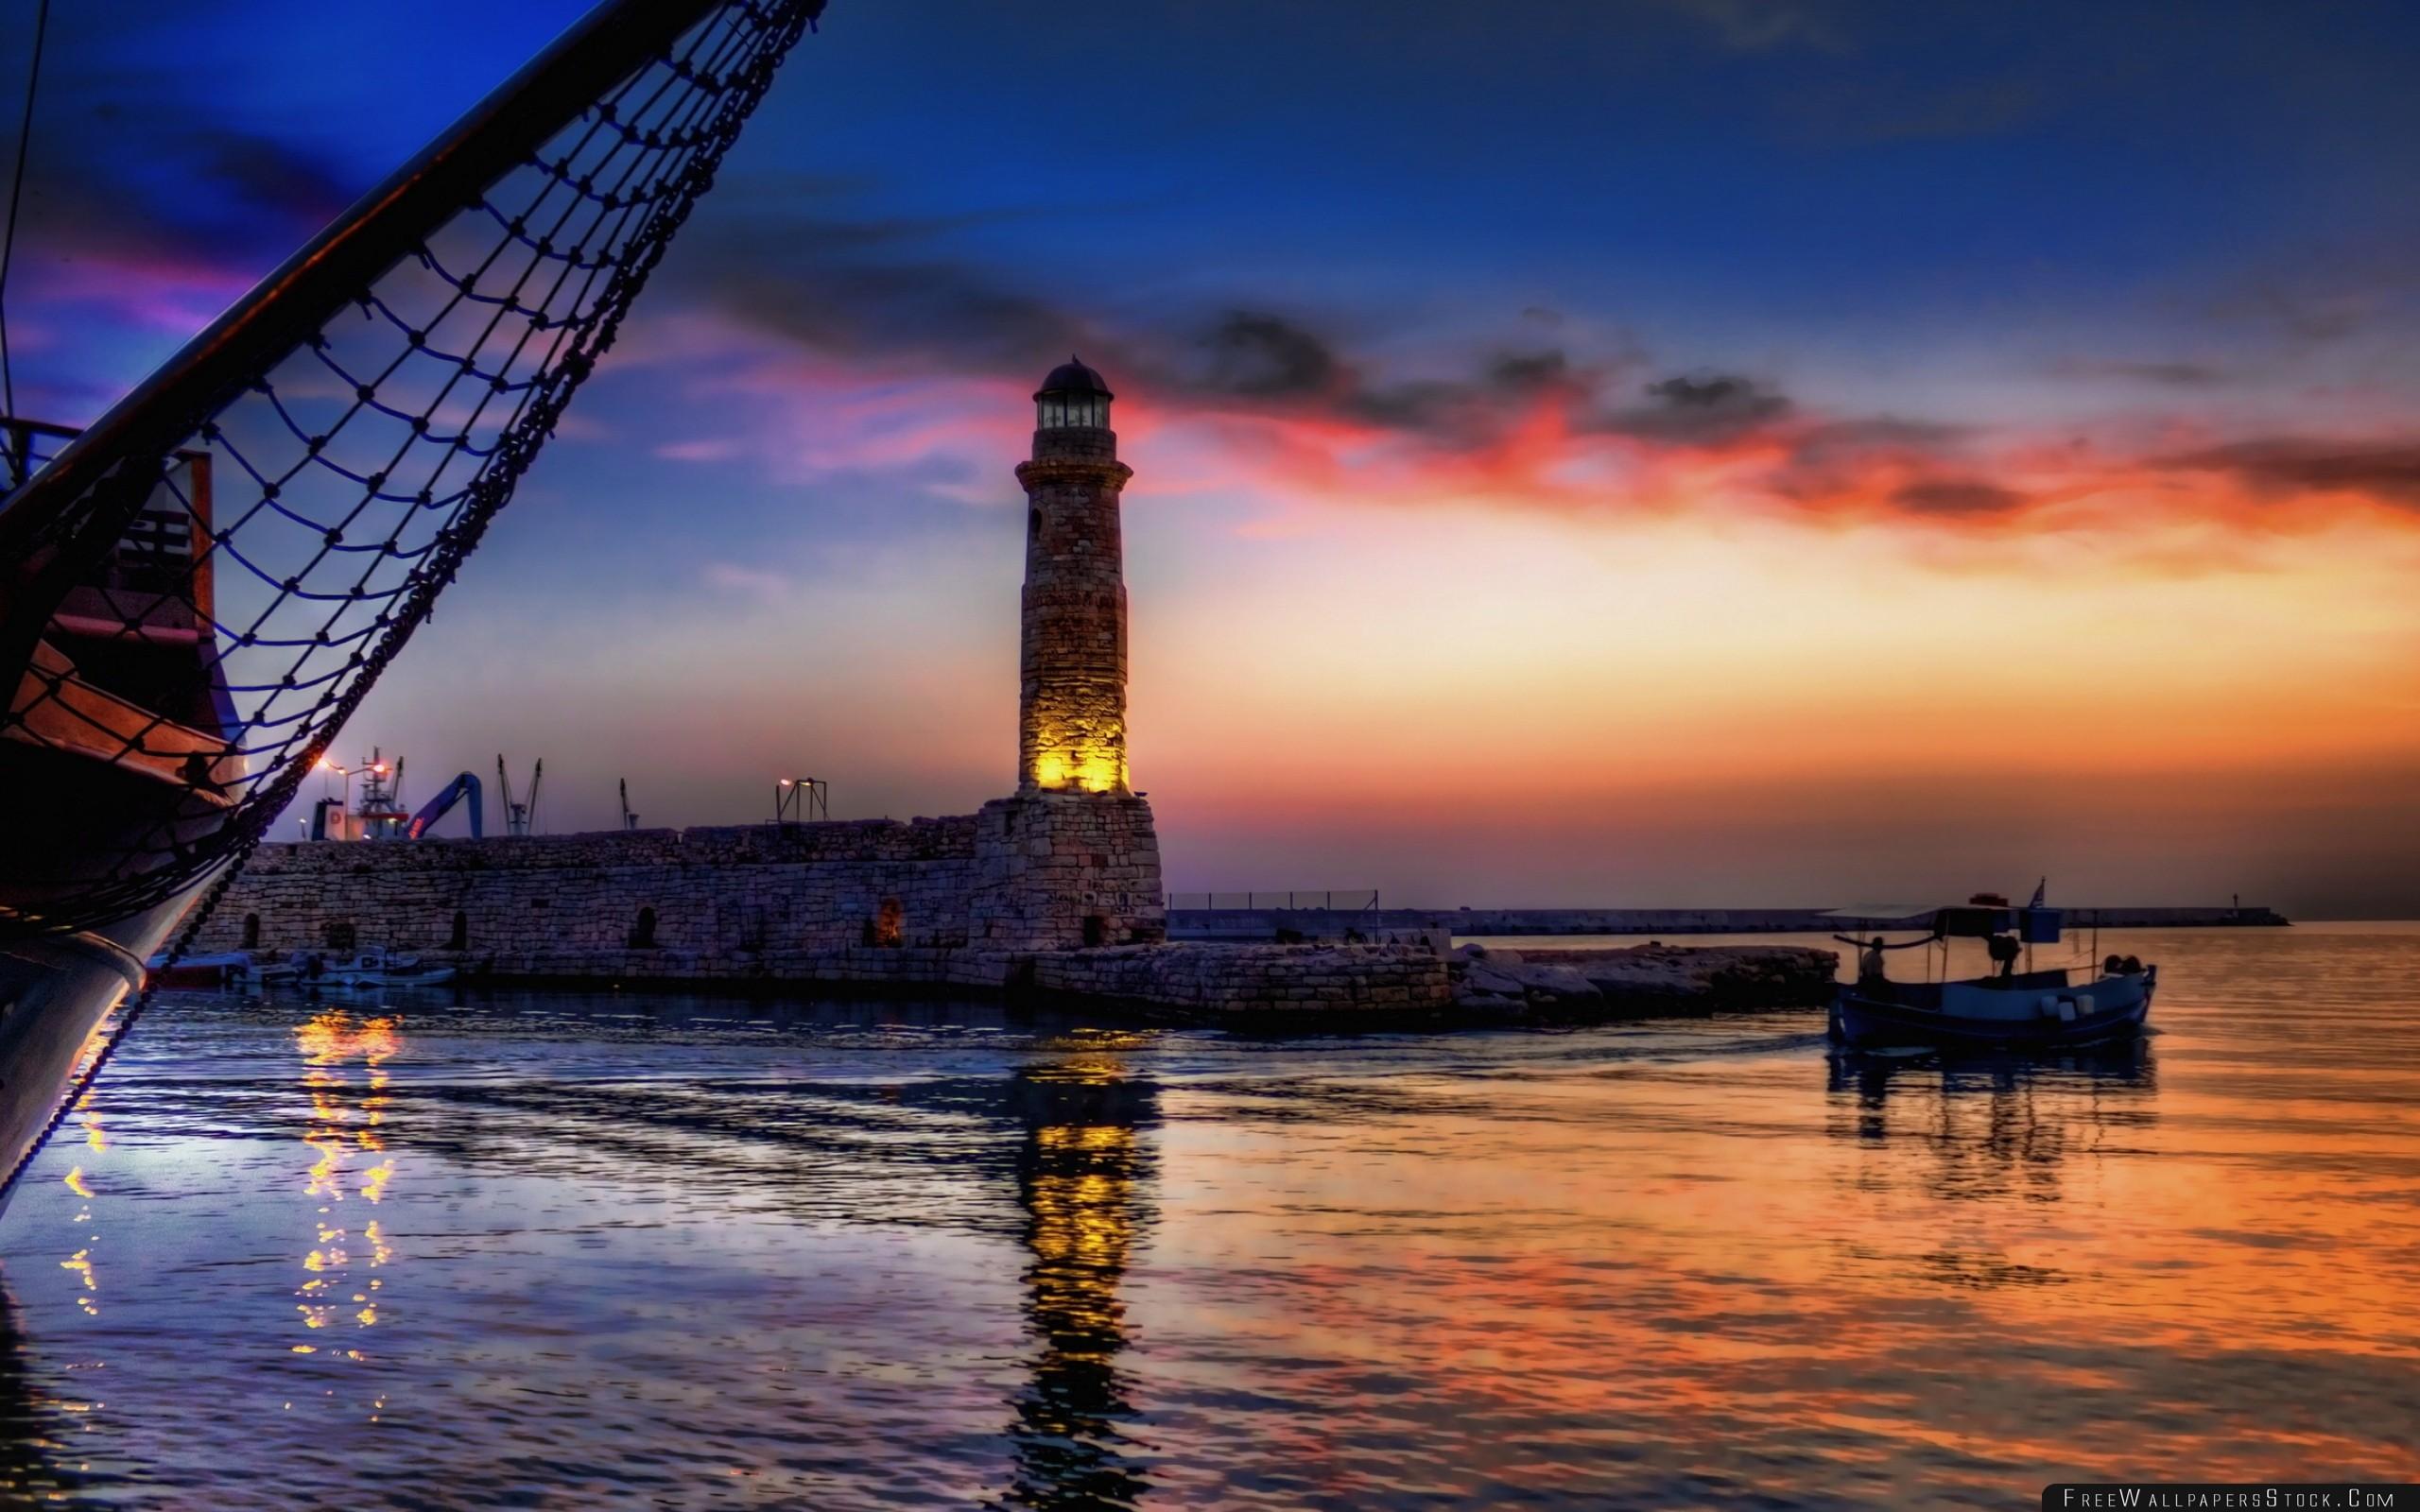 Download Free Wallpaper Night Beacon Light Boat Network